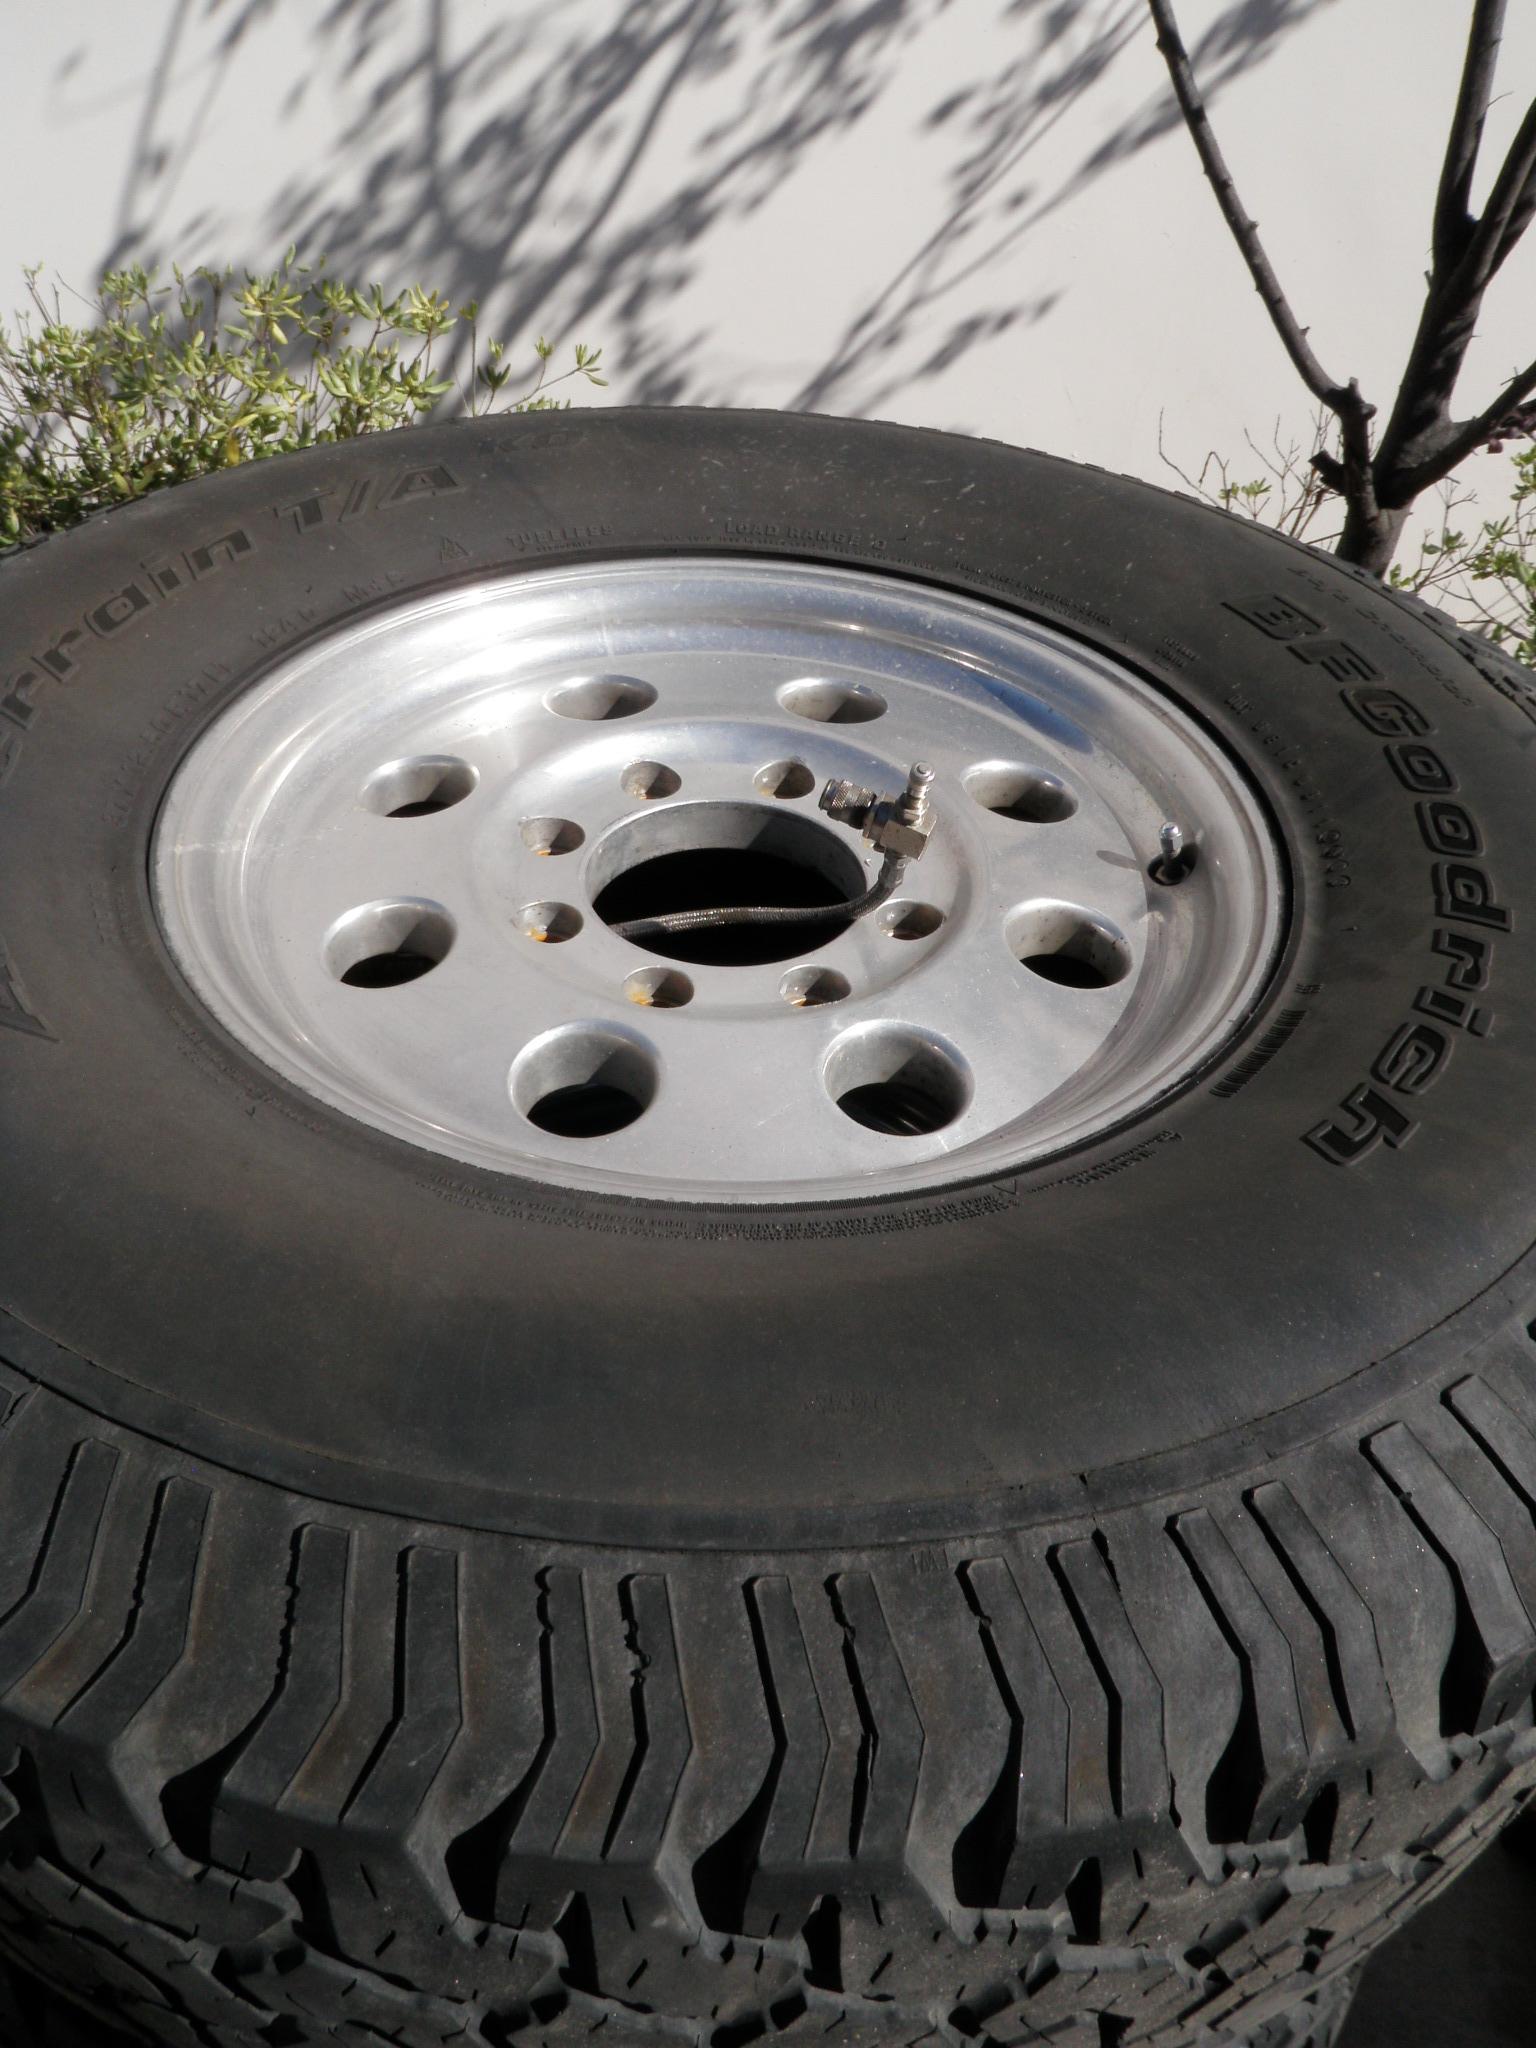 Recherche pneus & jantes Hummer H1  P1010088